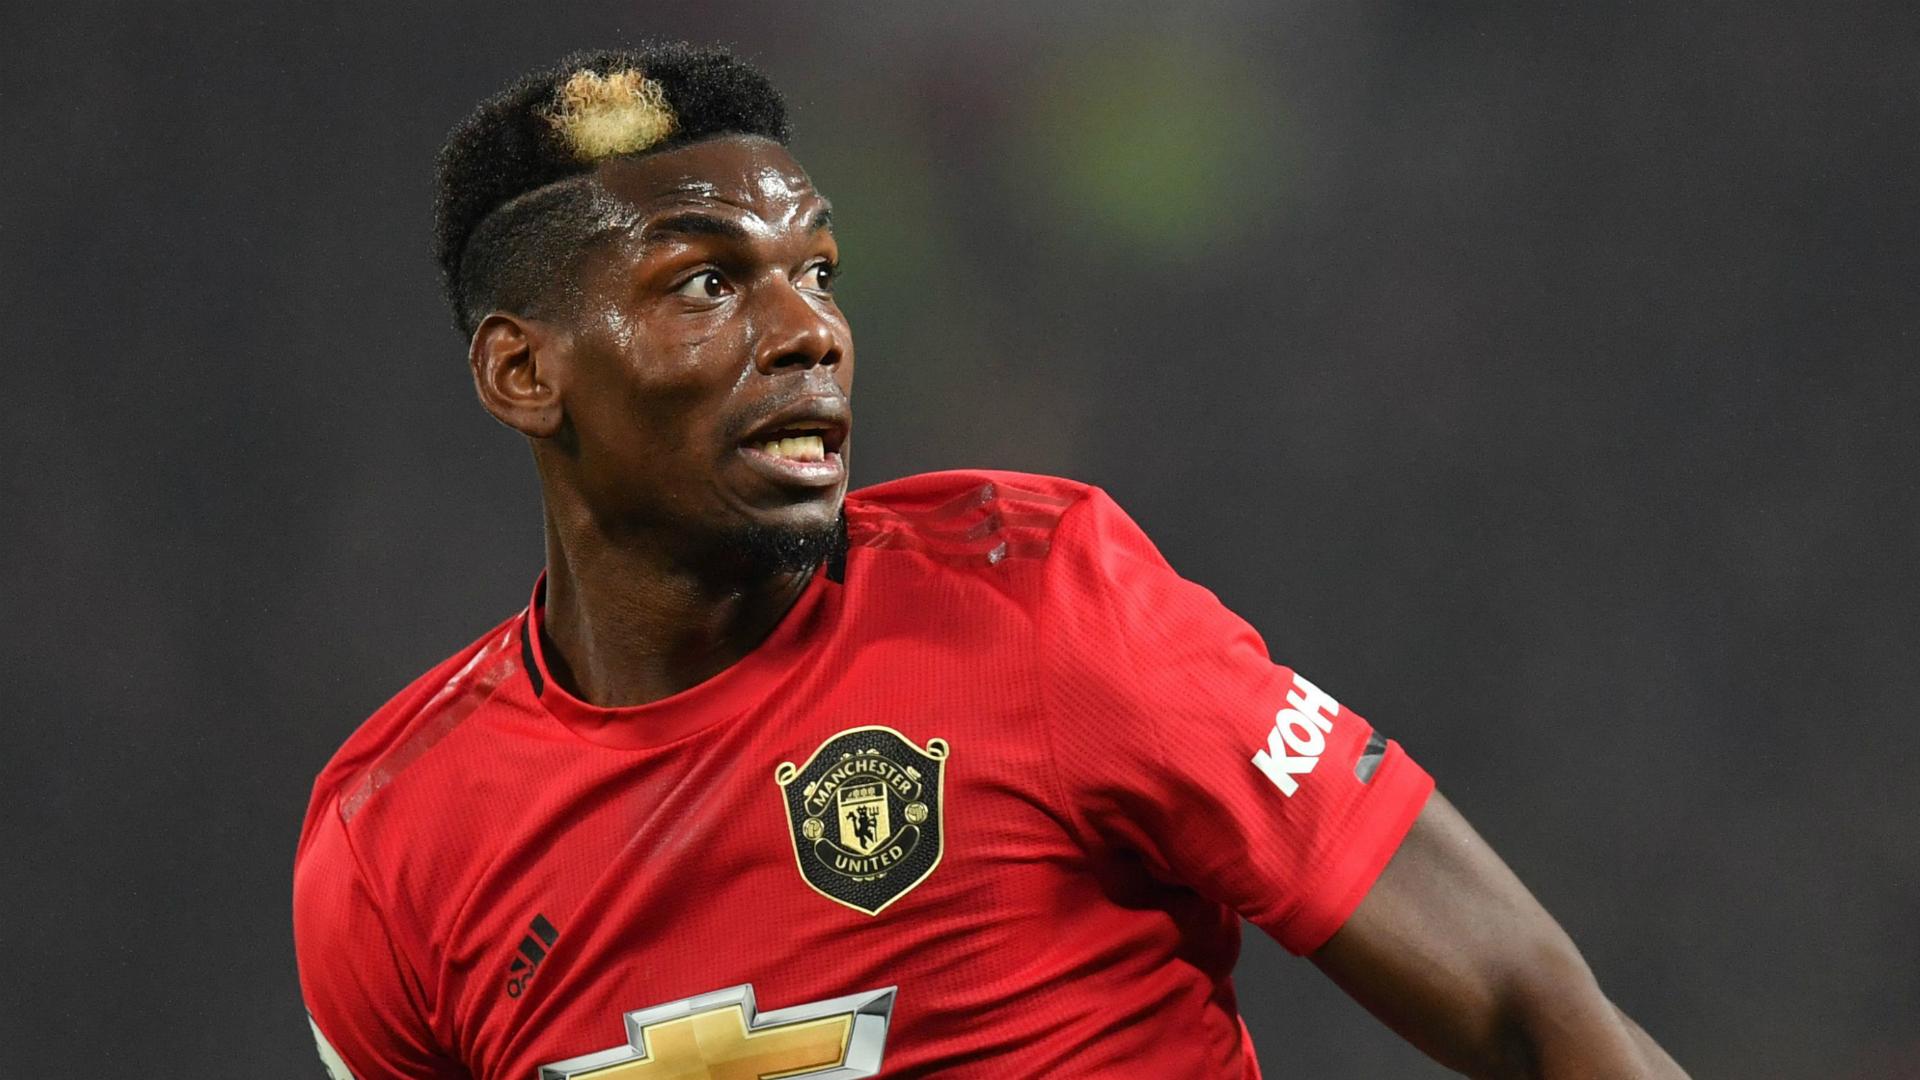 Manchester United Yakin Paul Pogba Akan Pergi Tapi Mungkin